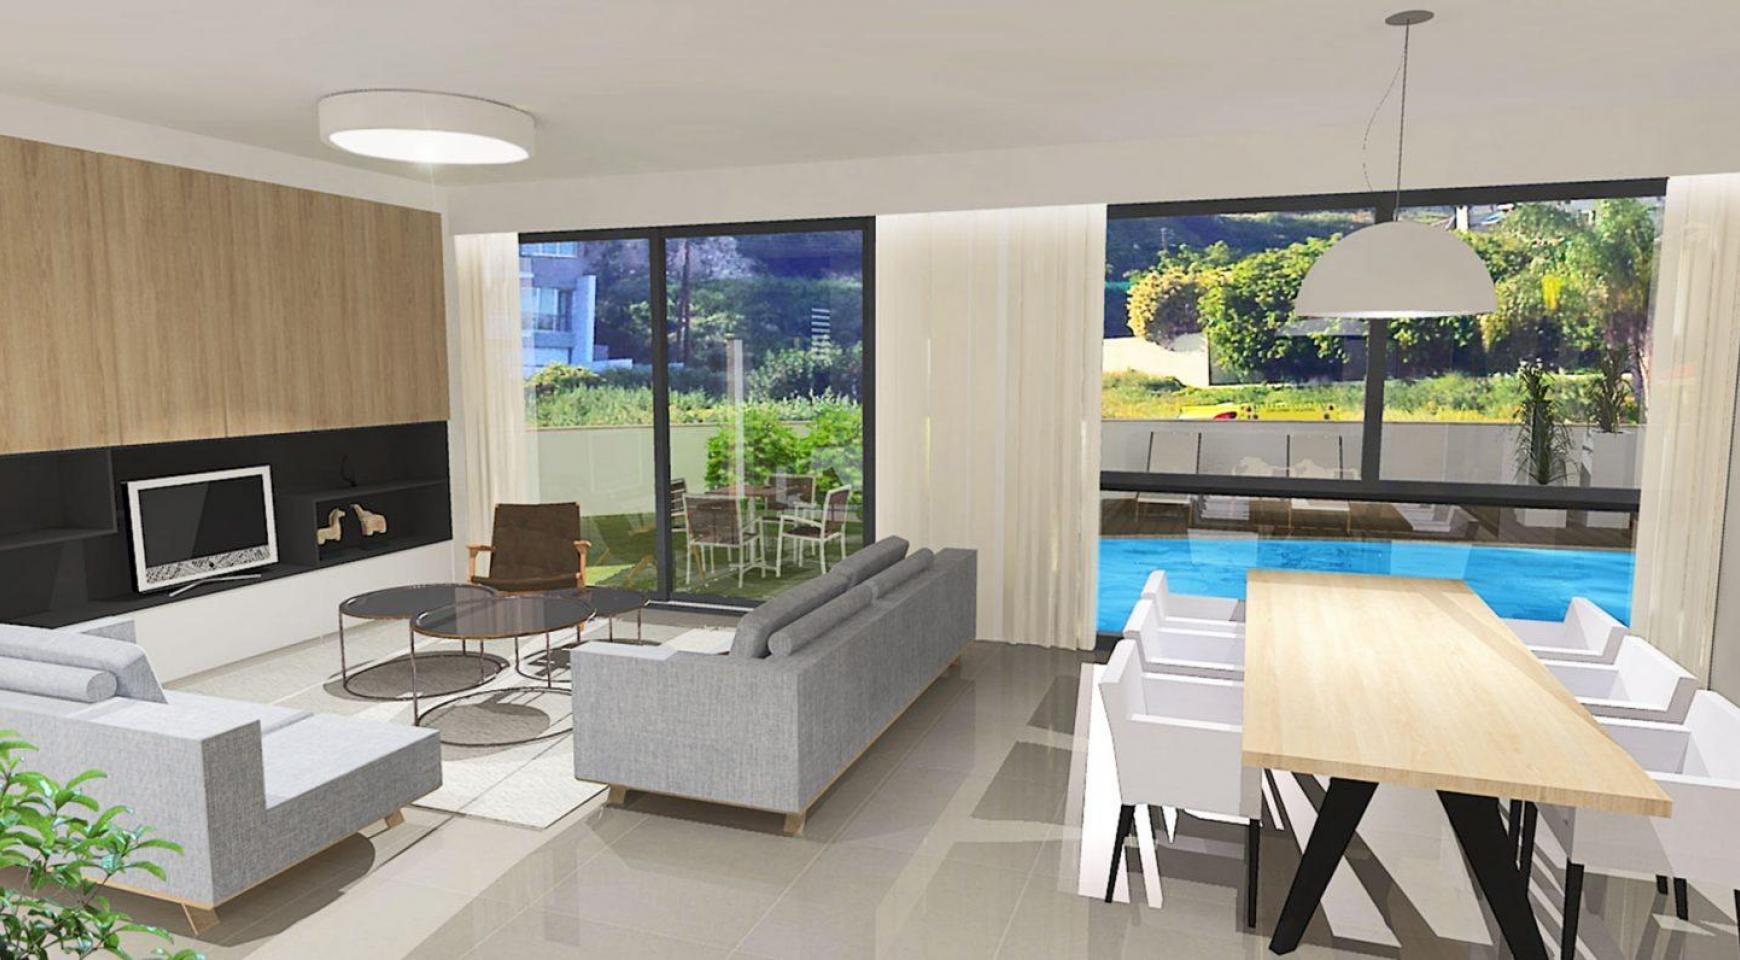 Spacious 4 Bedroom Villa in a New Complex in Agios Athanasios - 2